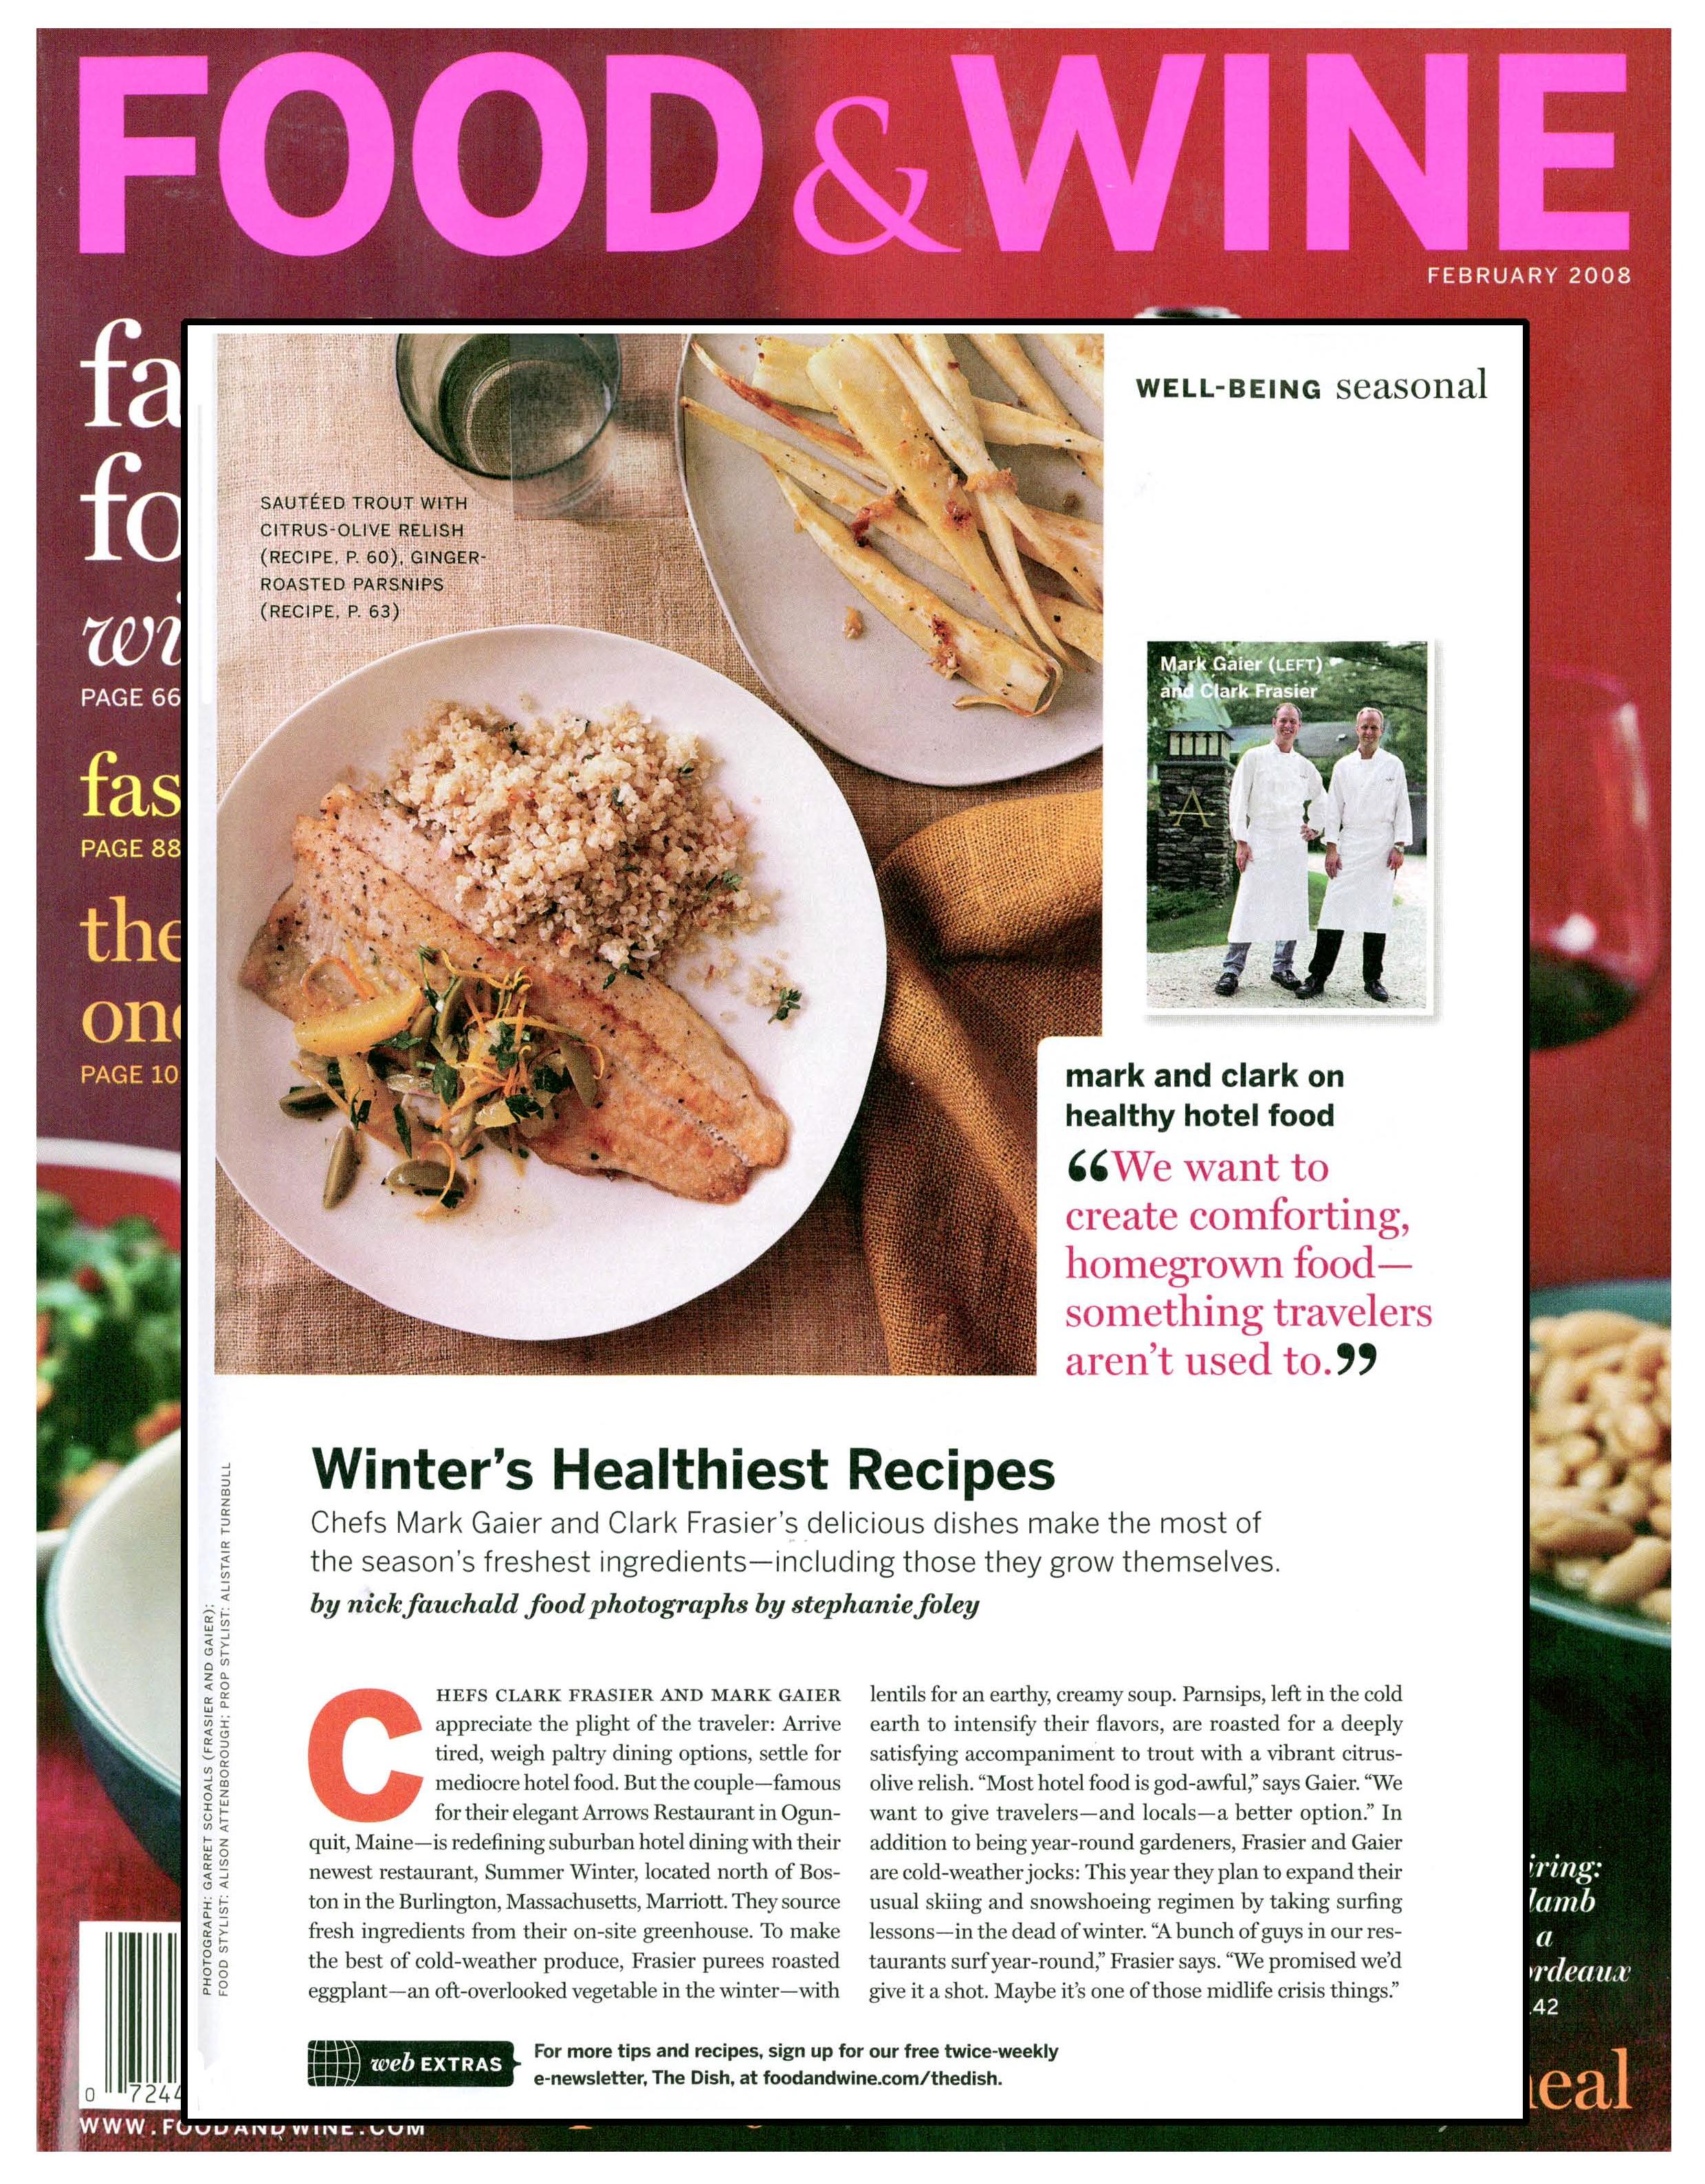 Food & Wine, Parsnips, Arrows Restaurant, Mark Gaier, Clark Frasier